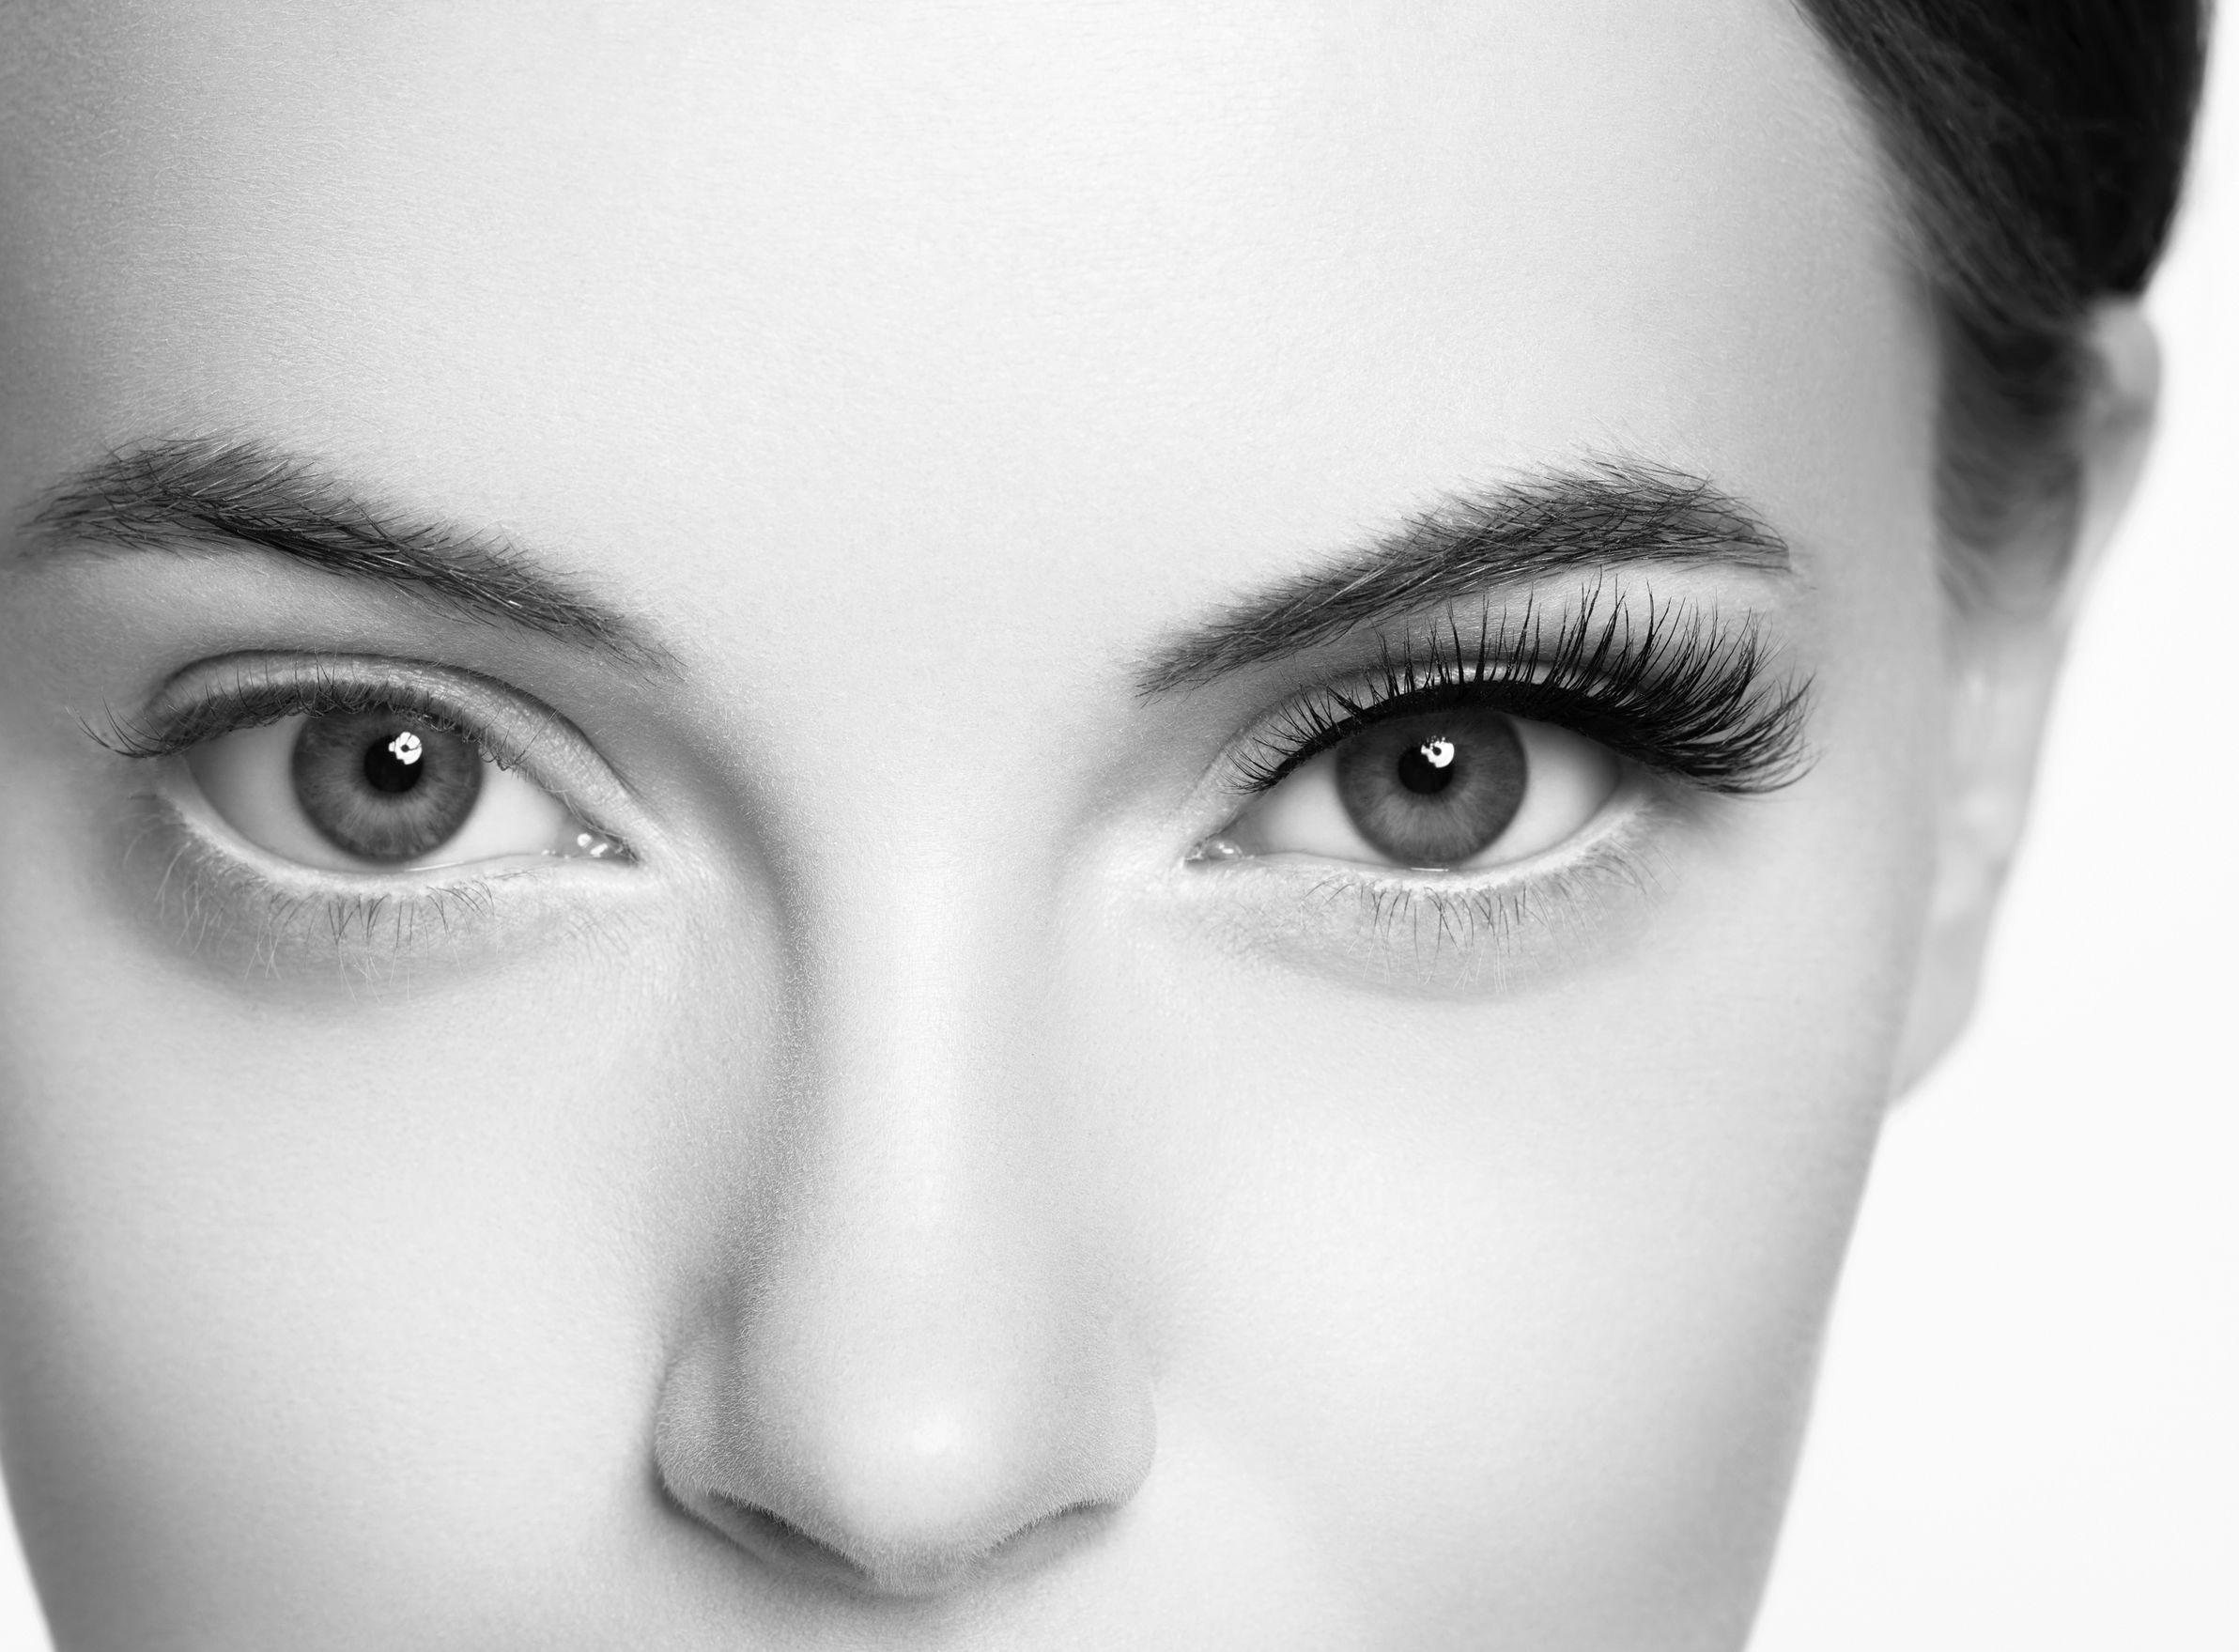 Eye lashes, lash extension woman  lashes close up macro monochrome. Studio shot.